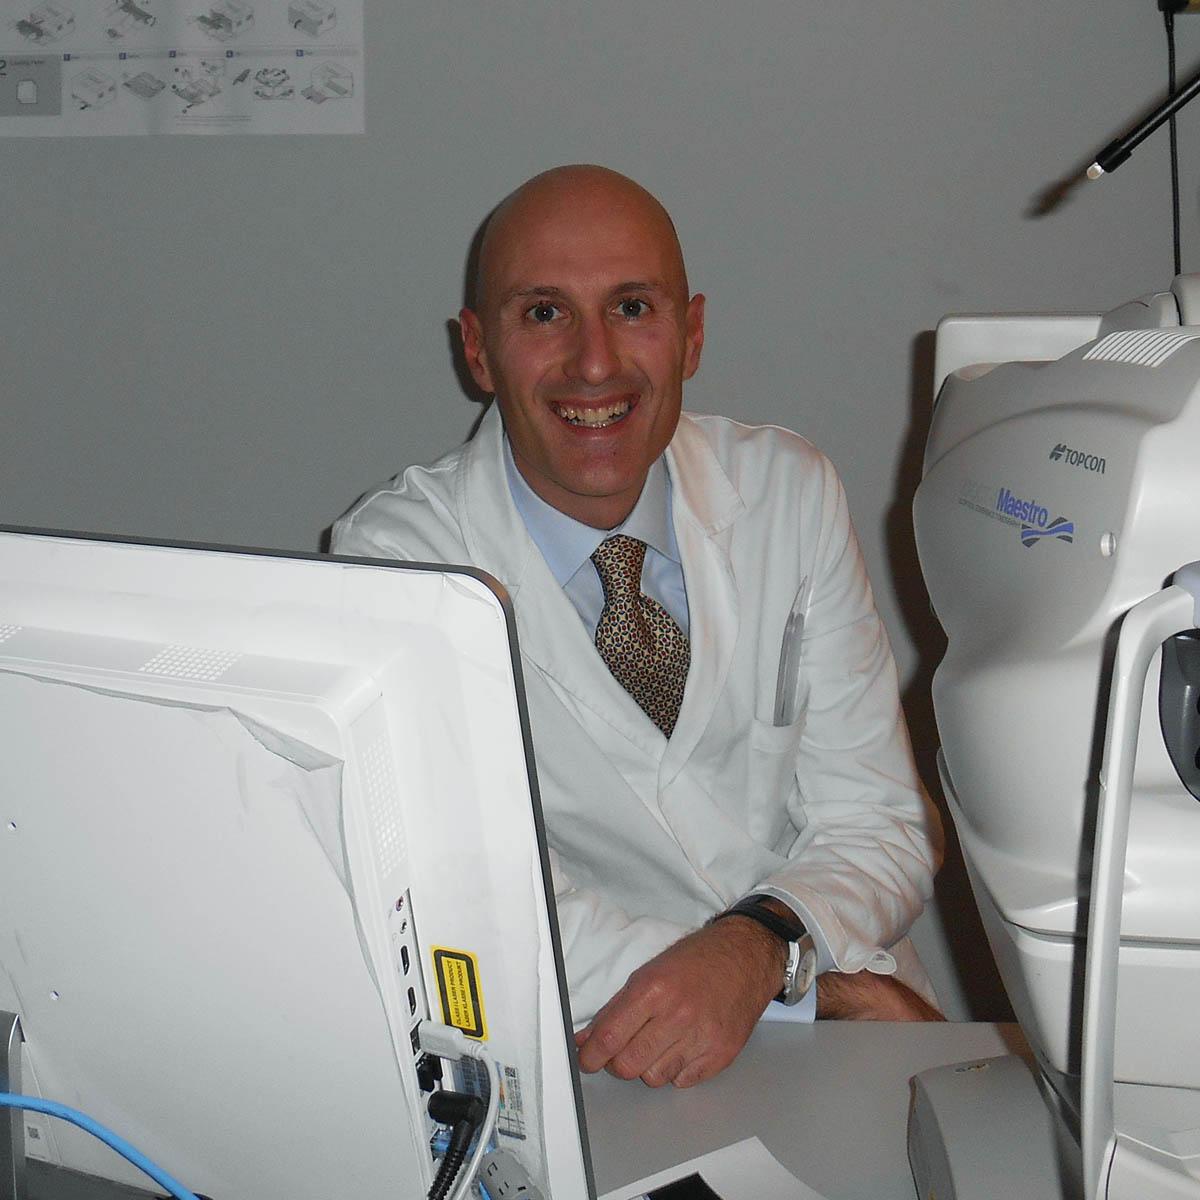 24e2aa62b9 Dr. Simone Bonanni - Oculistica San Paolo Pistoia - Centro Oculistico  d'avanguardia